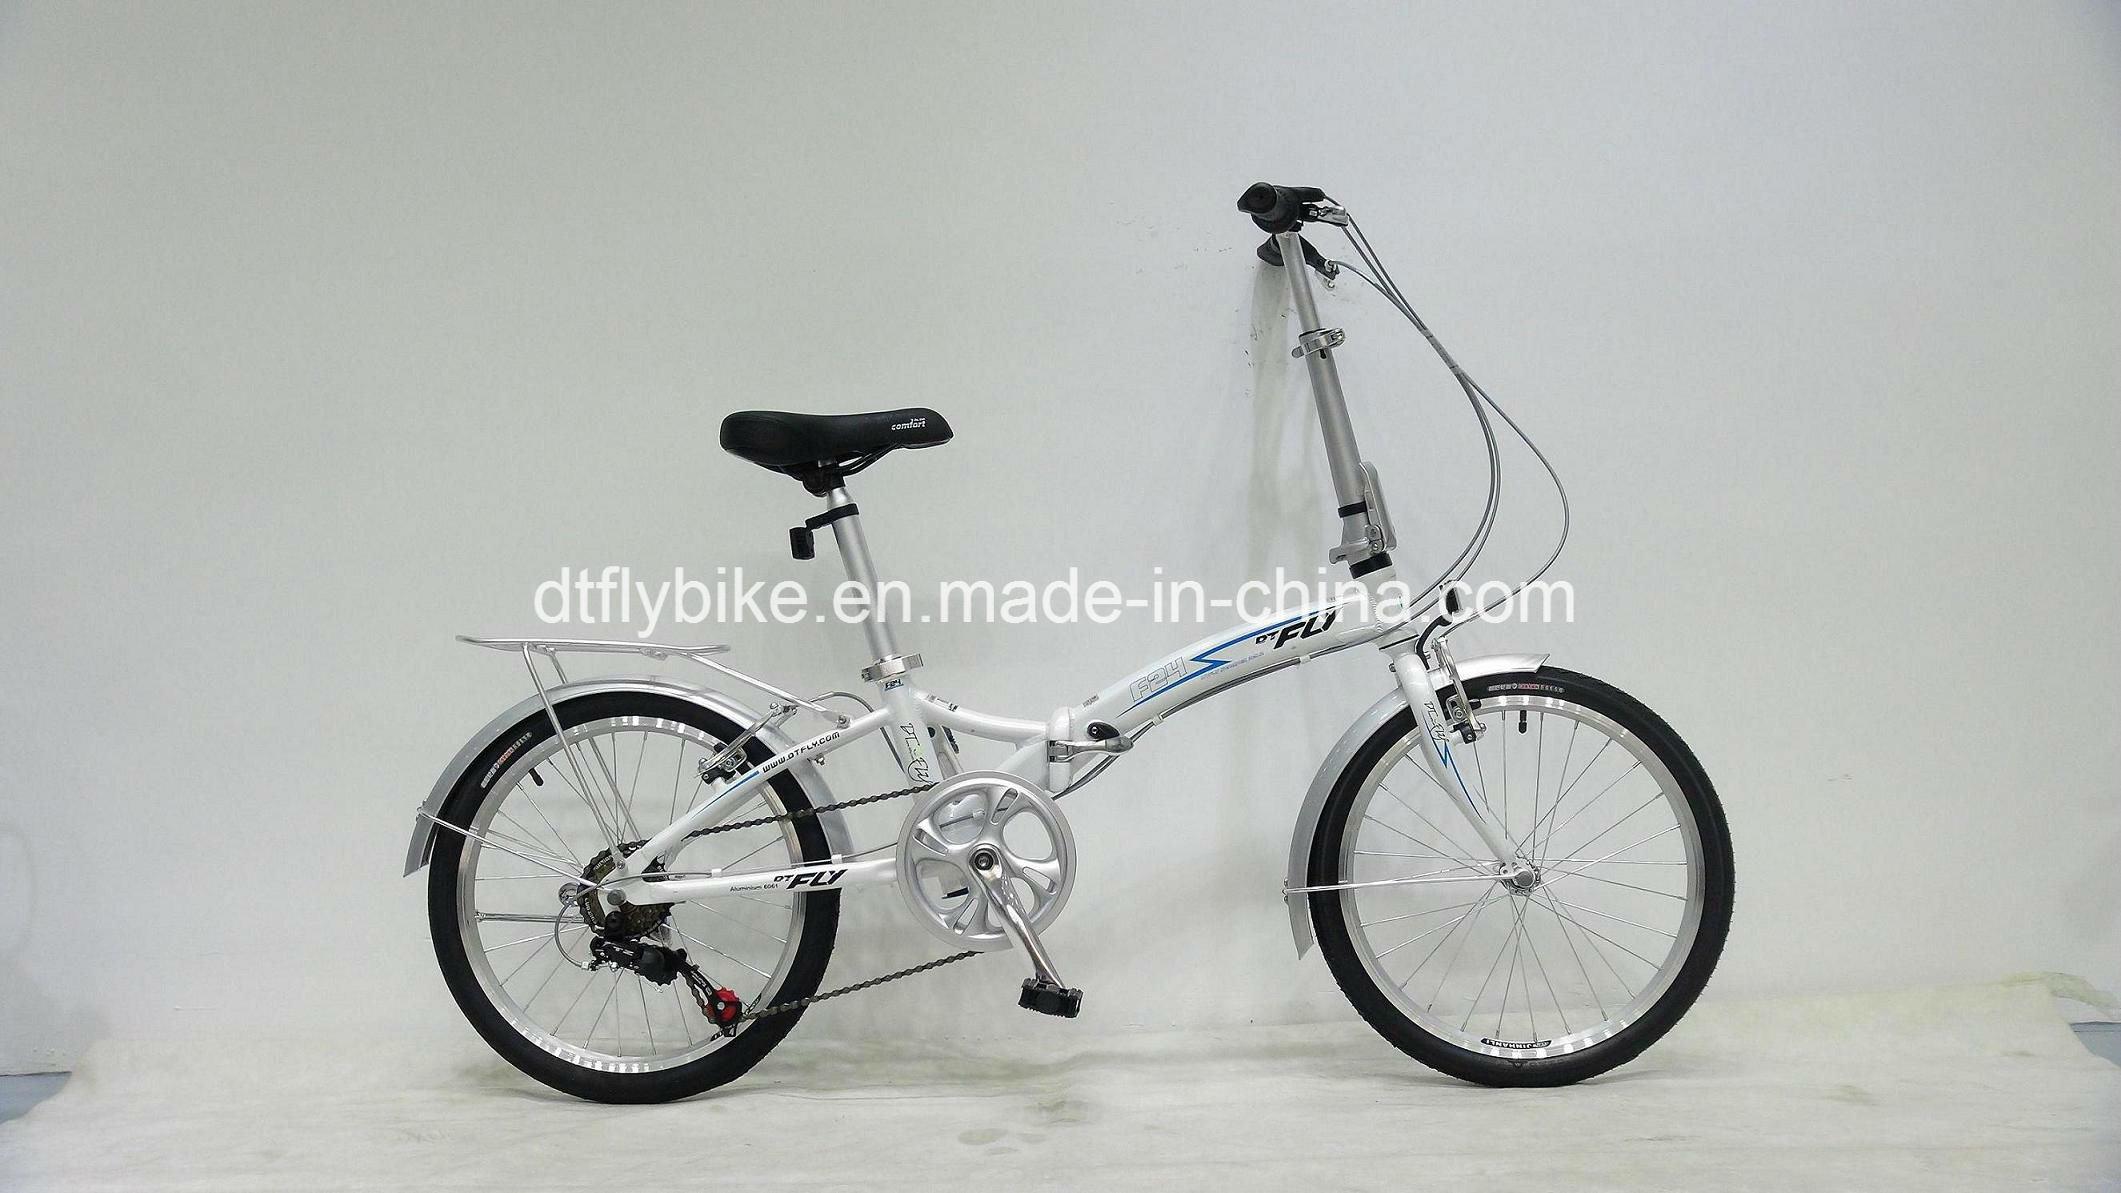 20inch Alloy Frame Folding Bike, Cheap Price Folding Bike,